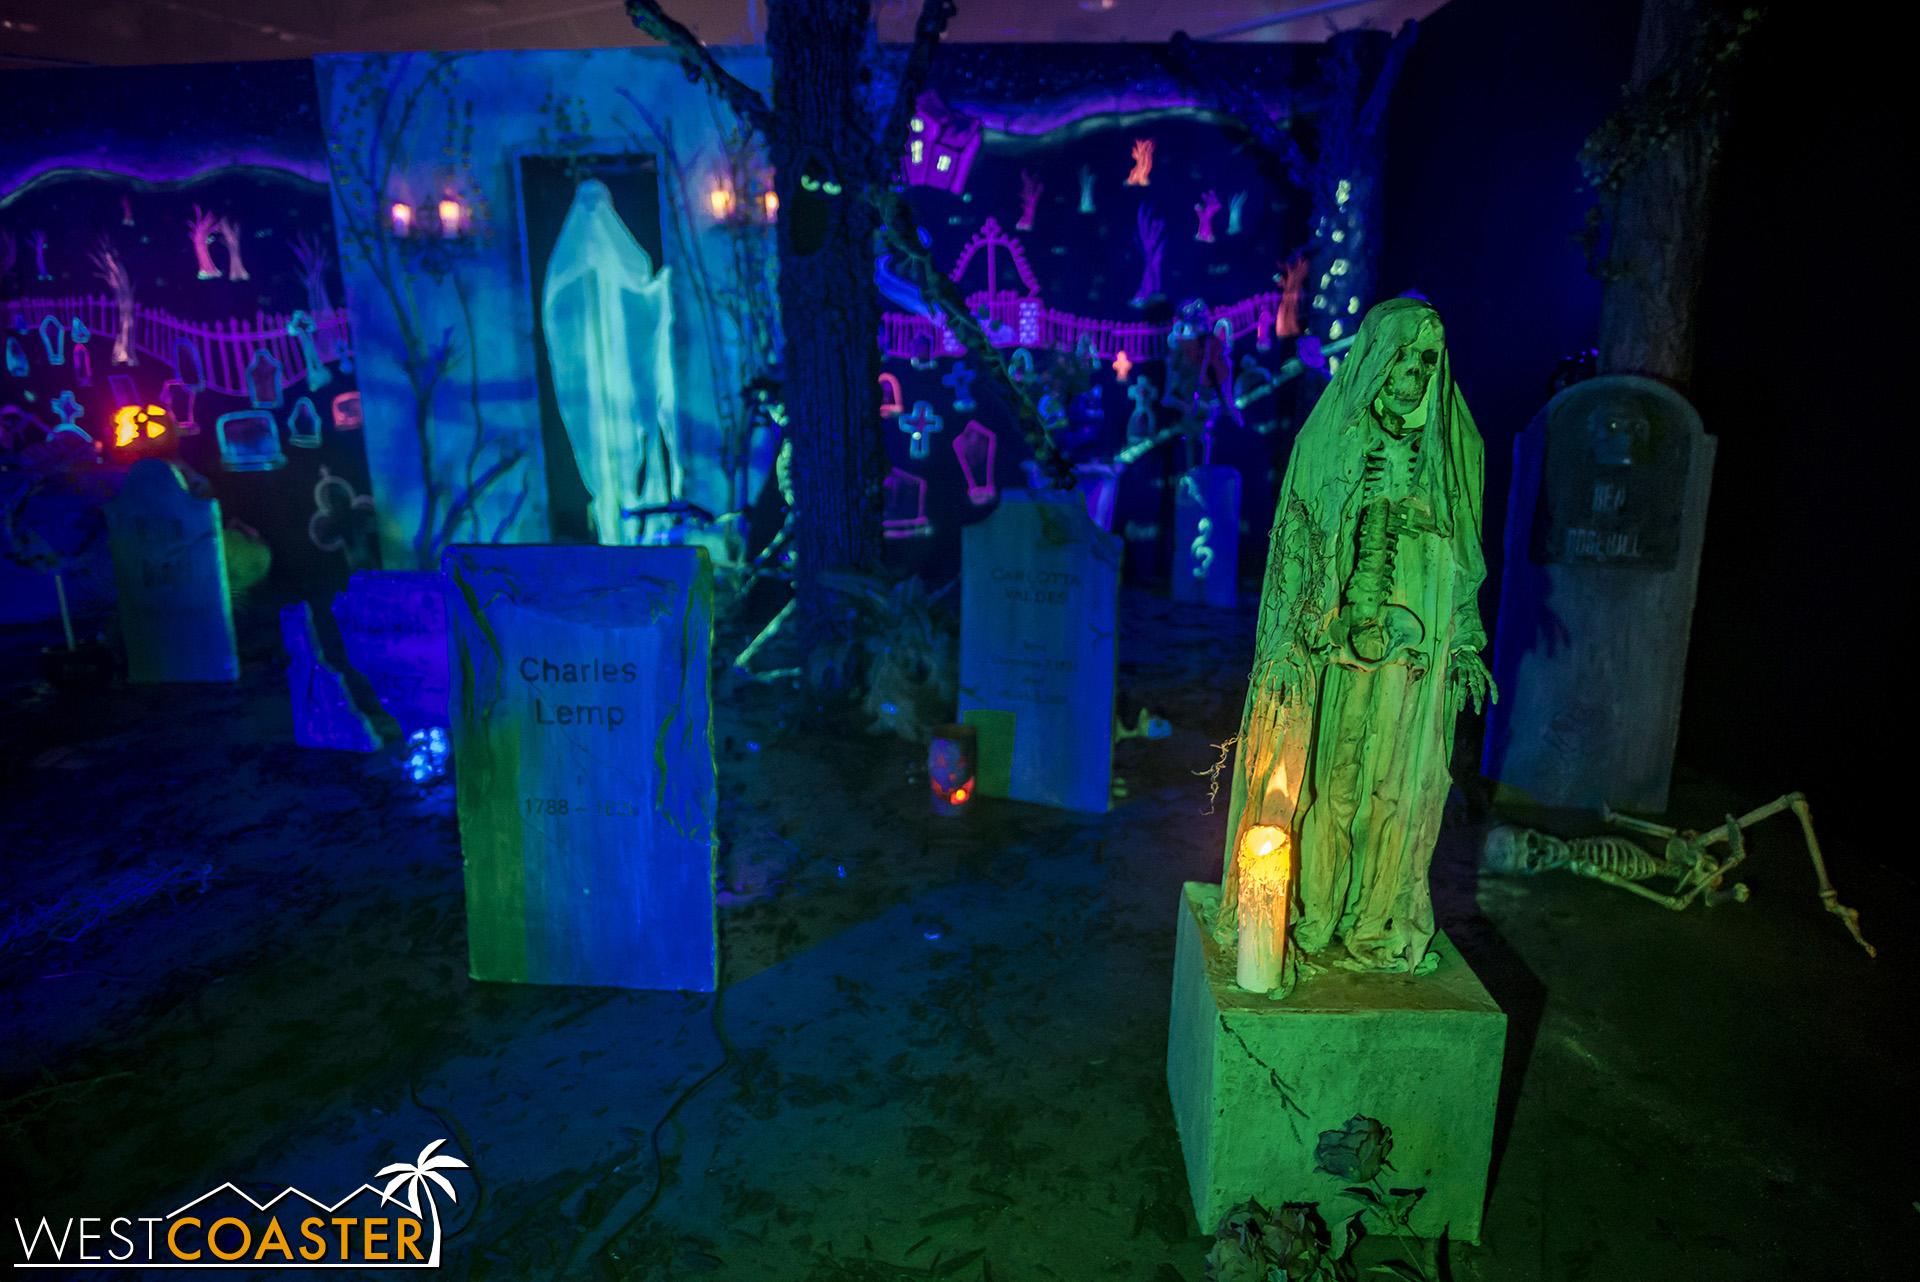 MSS-19_0809-02-RosehillHaunt-CemeteryCelebration-0004.jpg